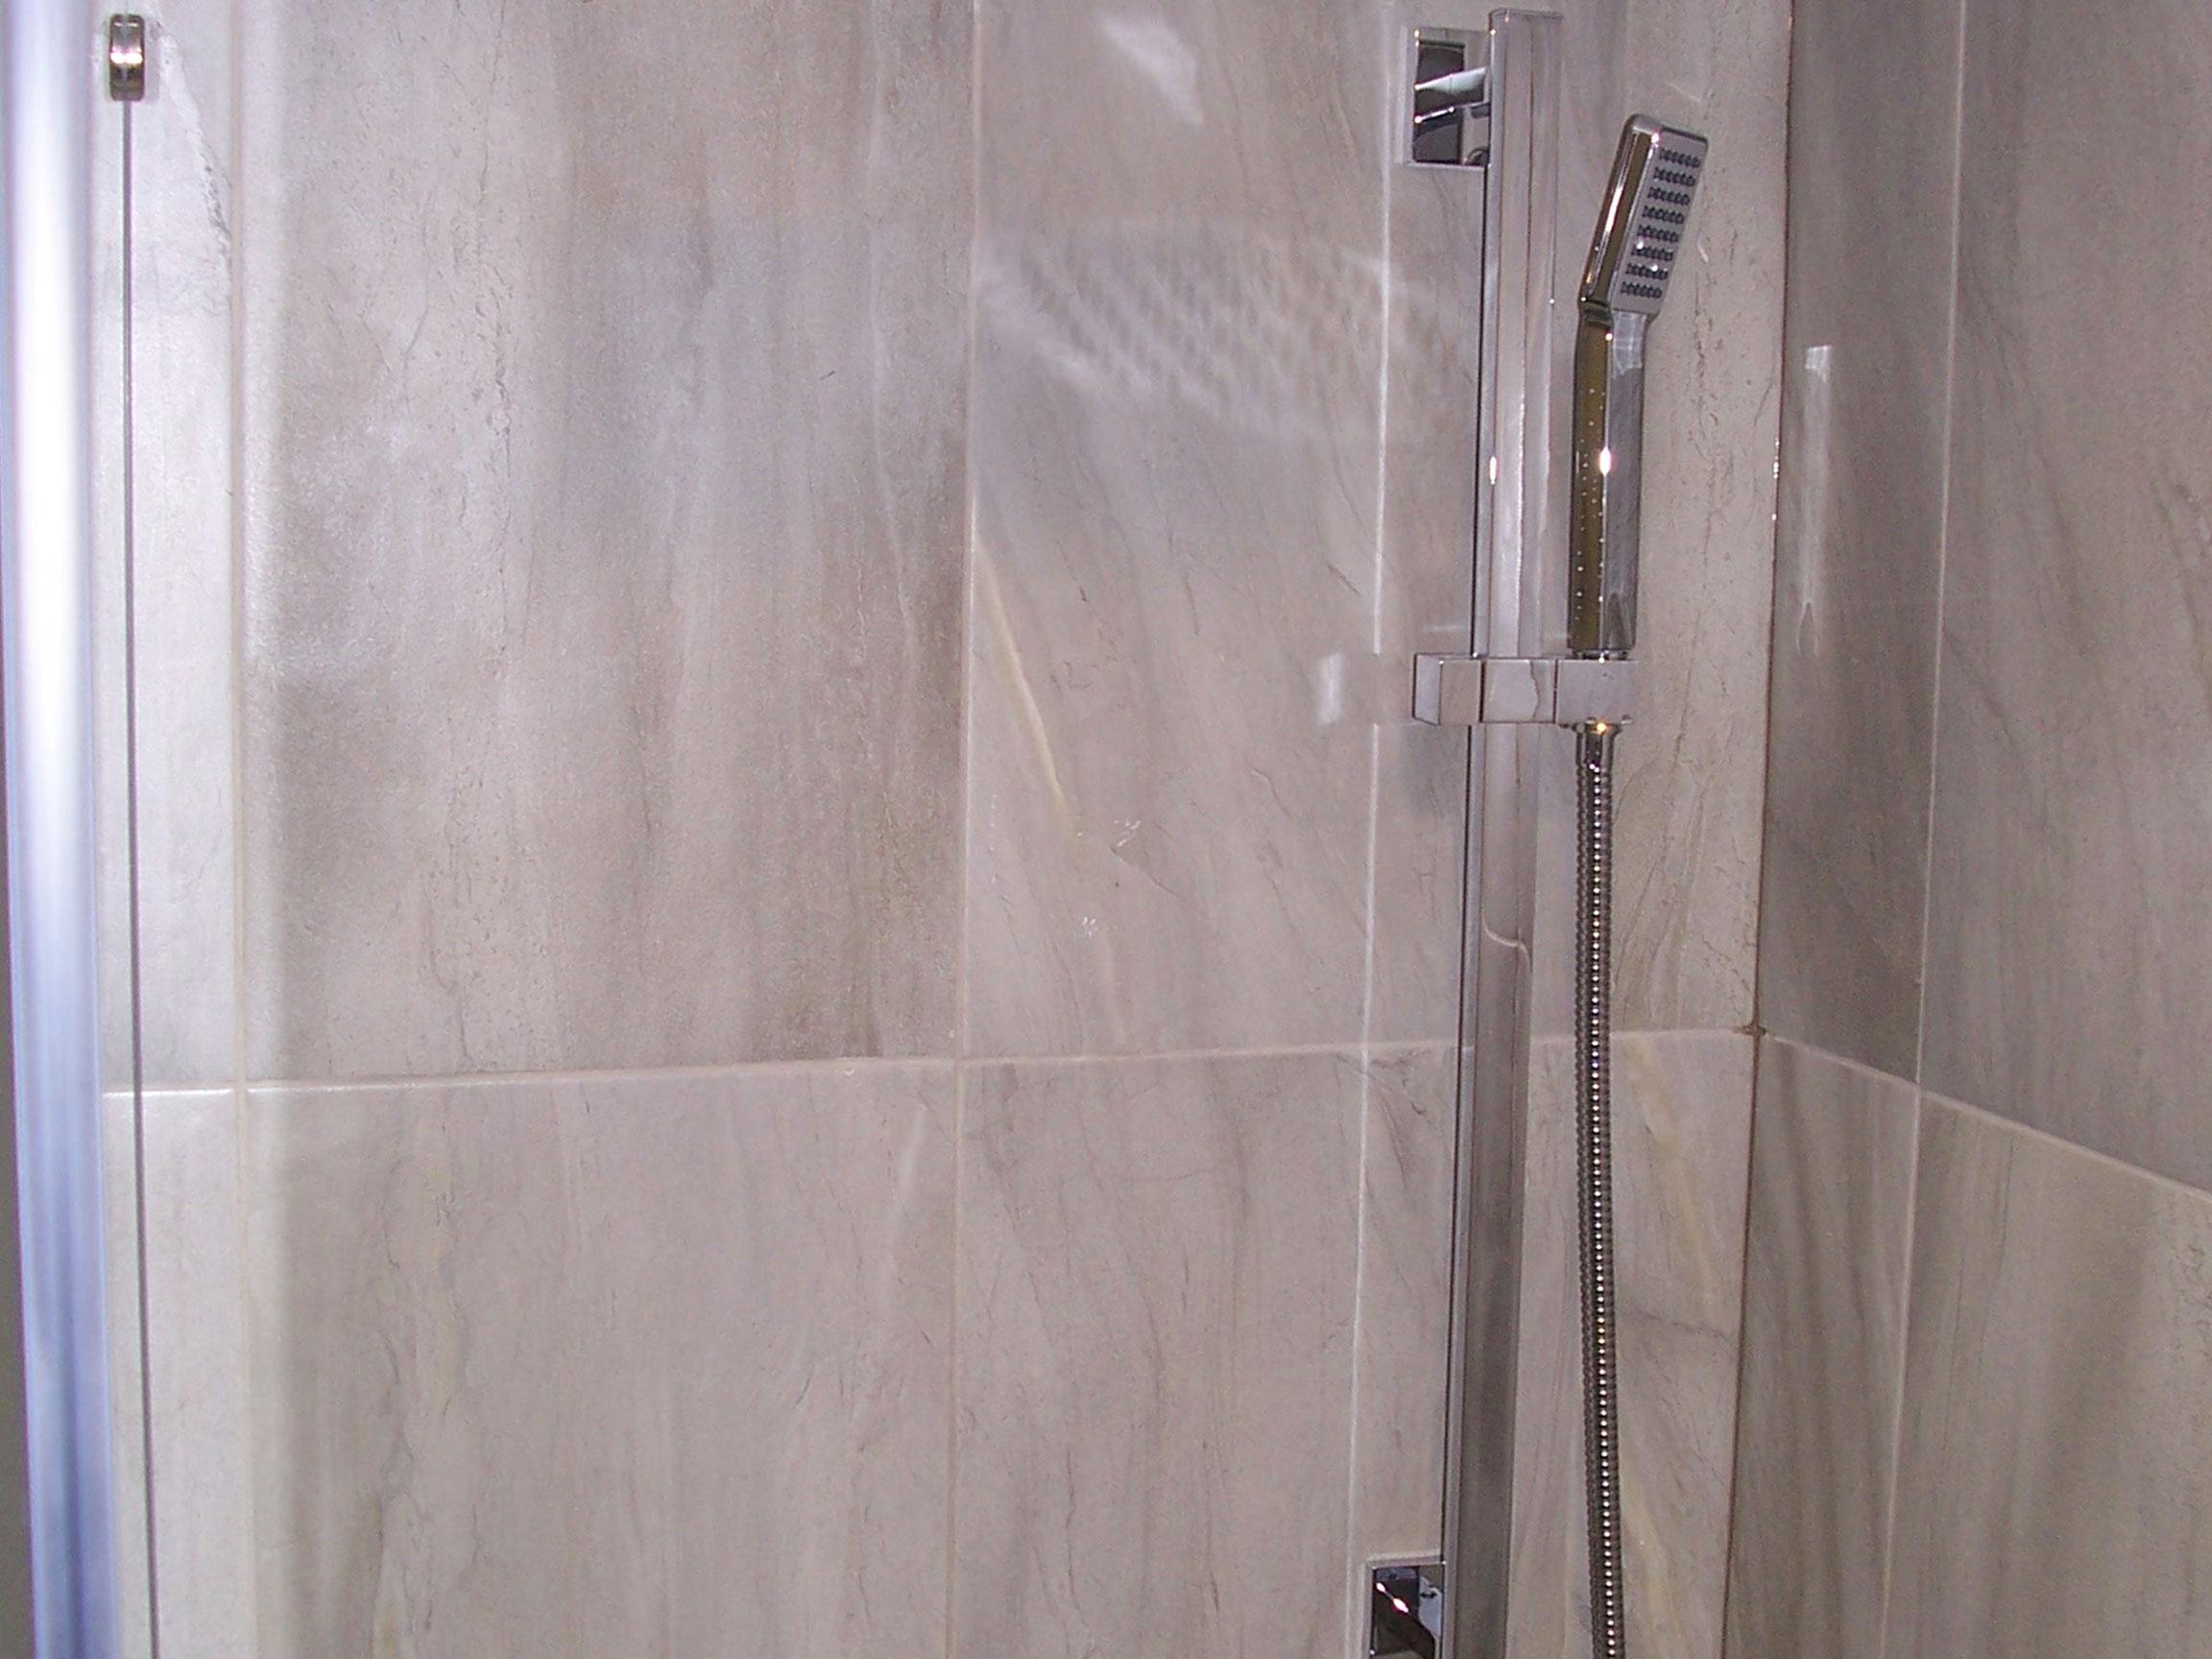 Bathroom Shower Head After